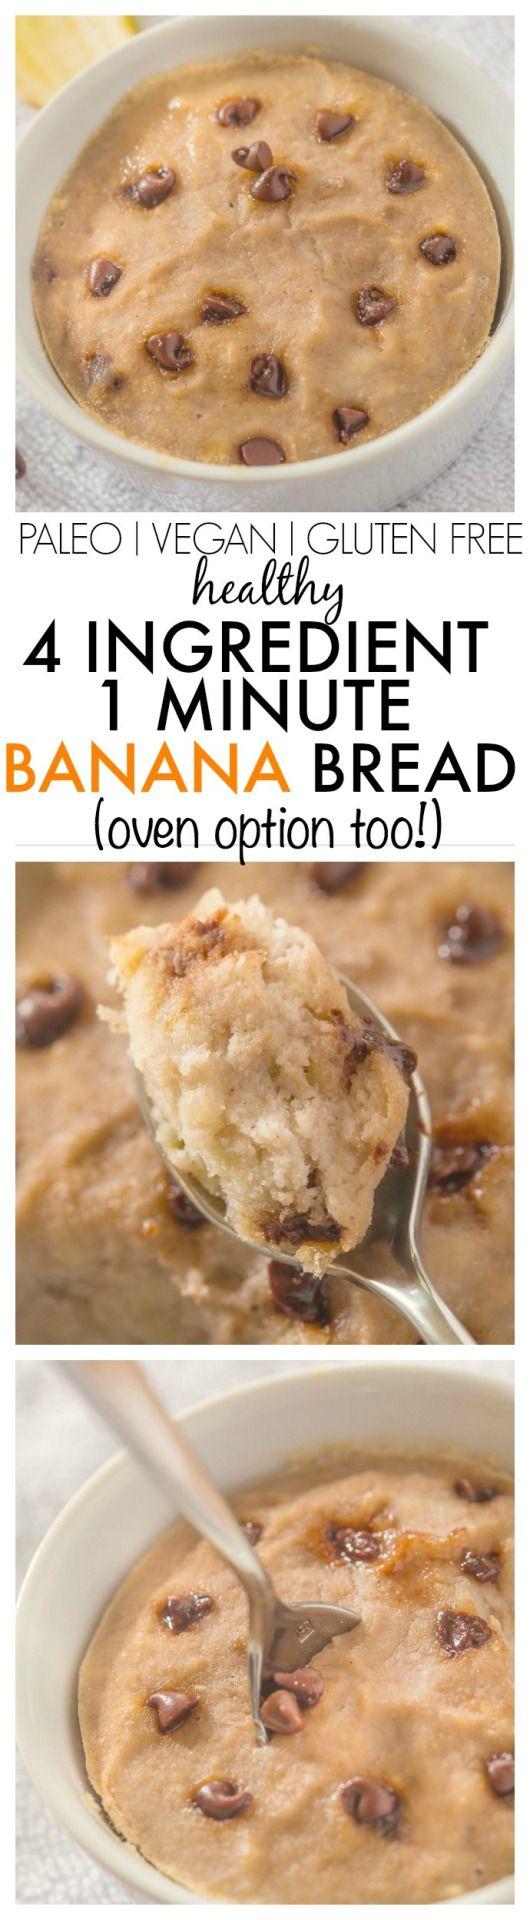 (via Healthy 1 Minute Banana Bread) - A collection of vegan recipes